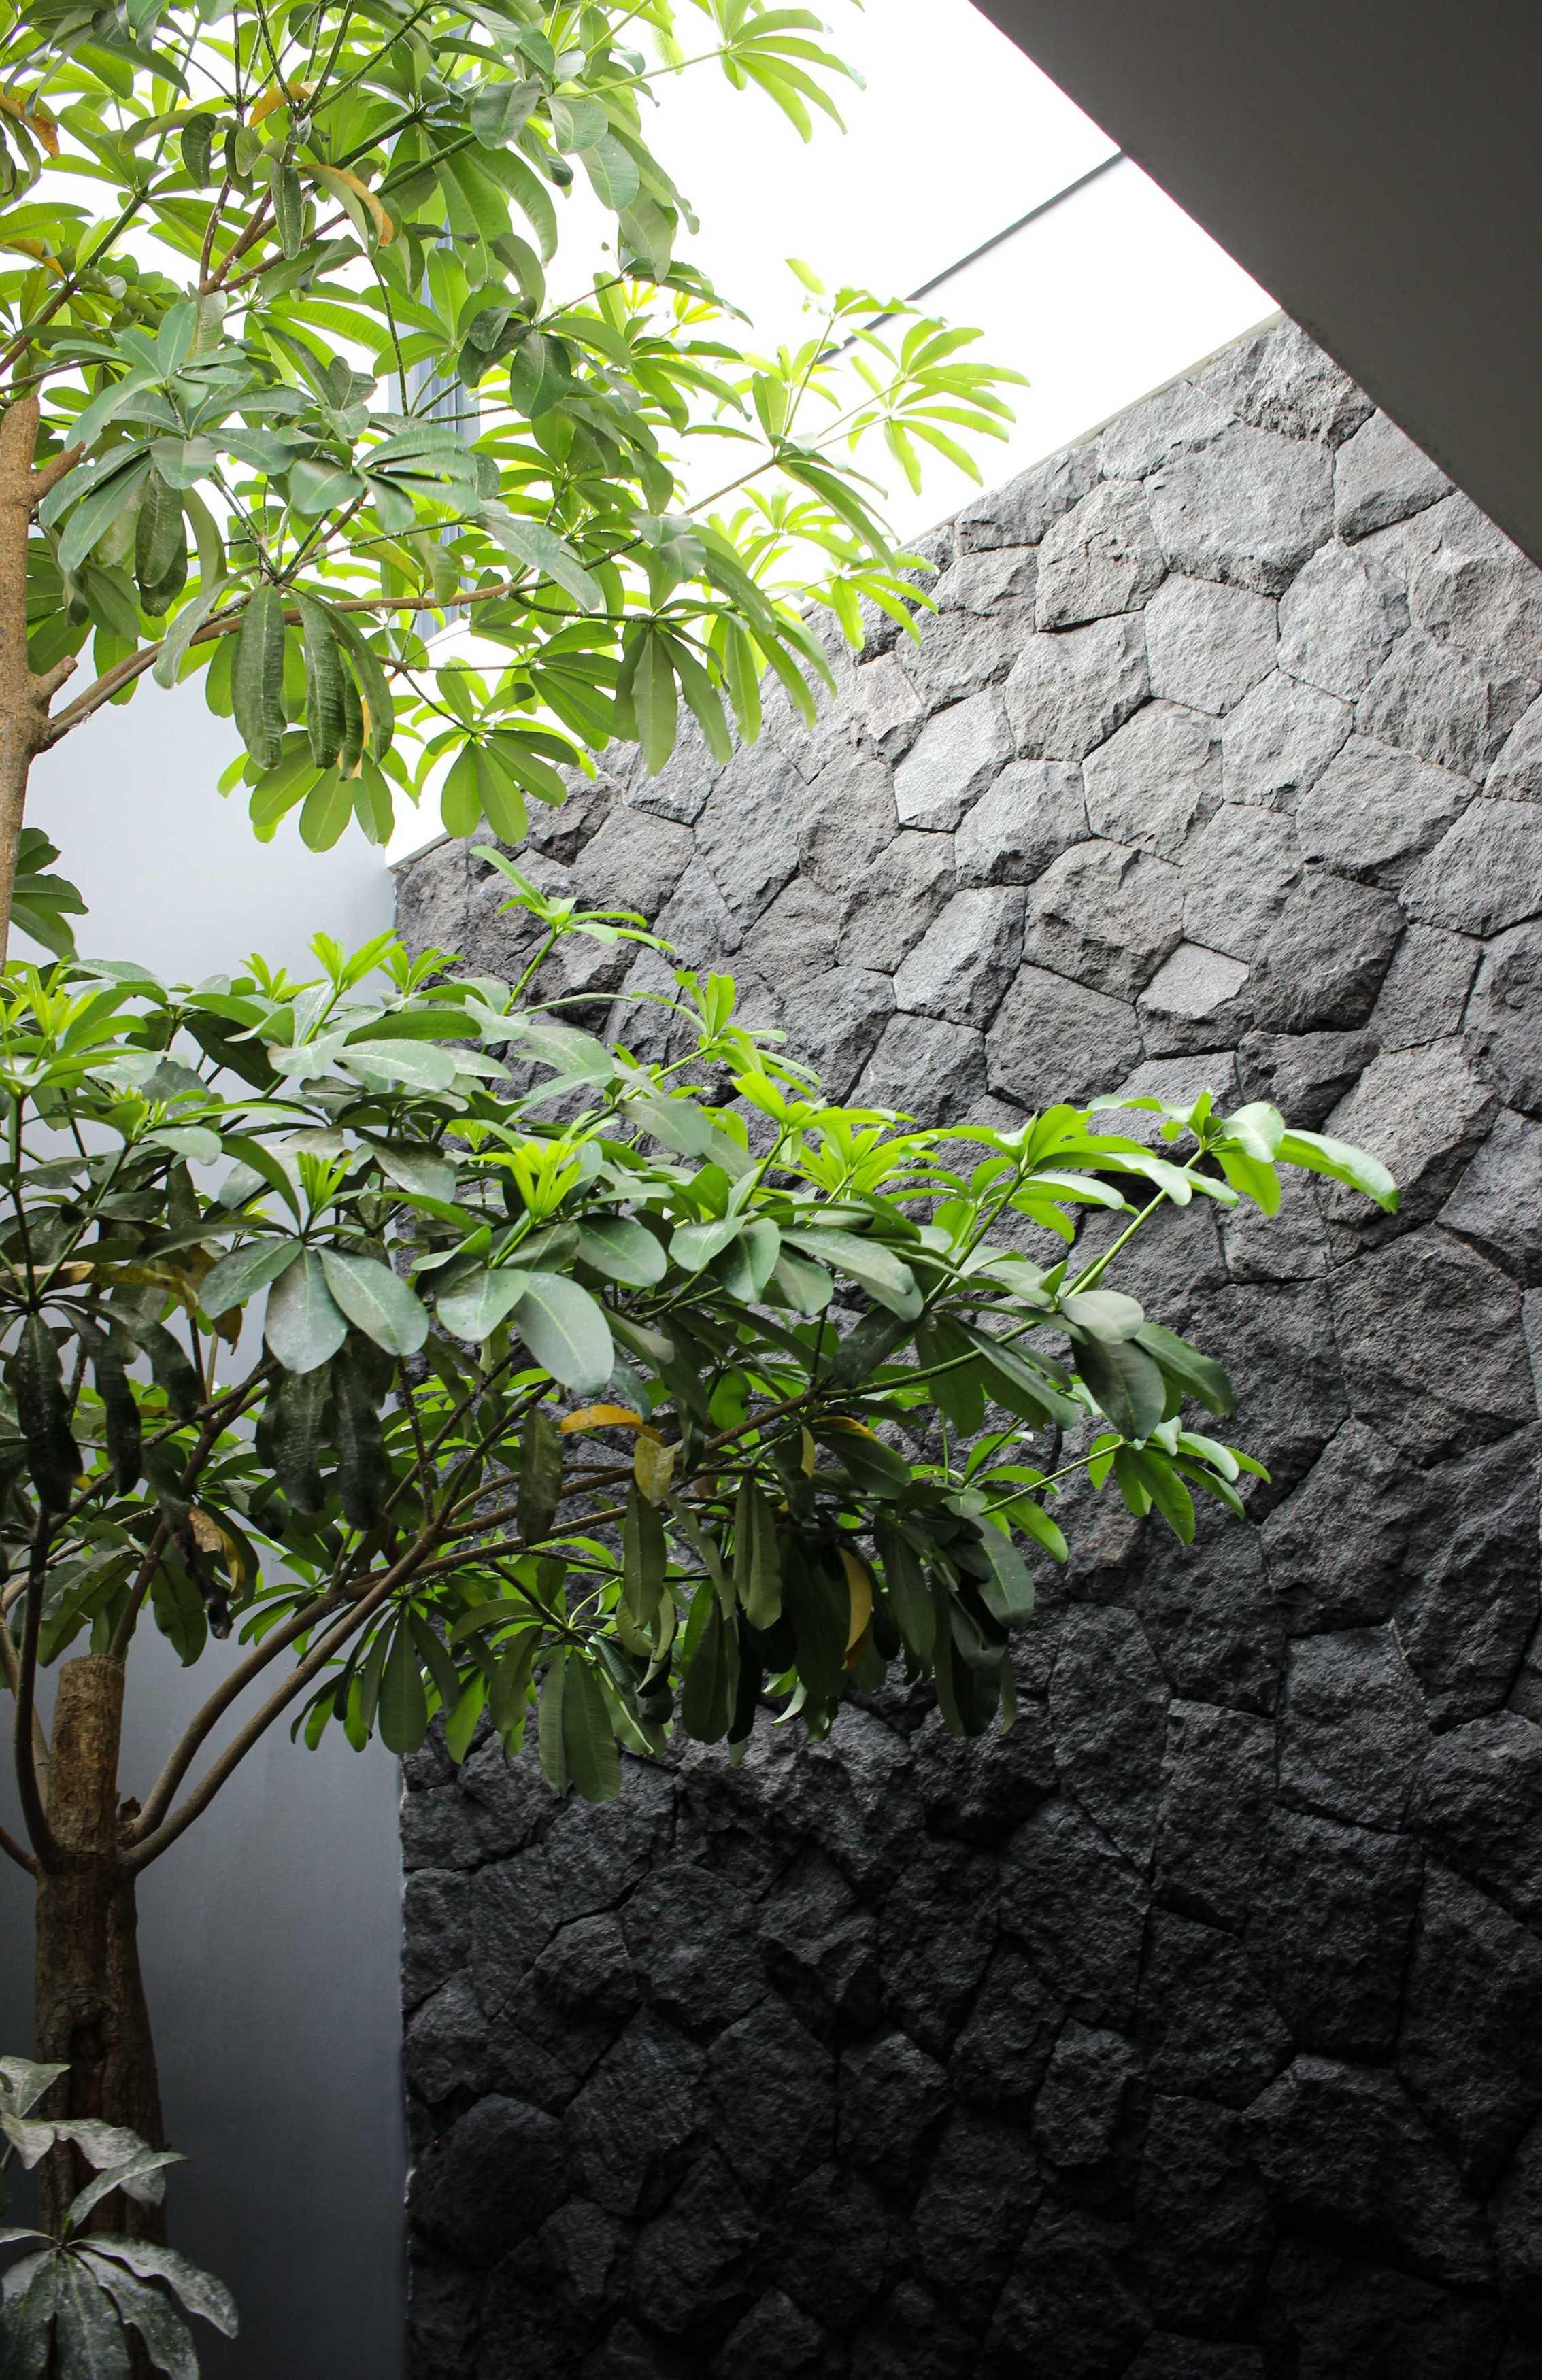 Y0 Design Architect S House Kec. Srono, Kabupaten Banyuwangi, Jawa Timur, Indonesia Kec. Srono, Kabupaten Banyuwangi, Jawa Timur, Indonesia Yohanes-Iswara-Limandjaya-S-House   121089